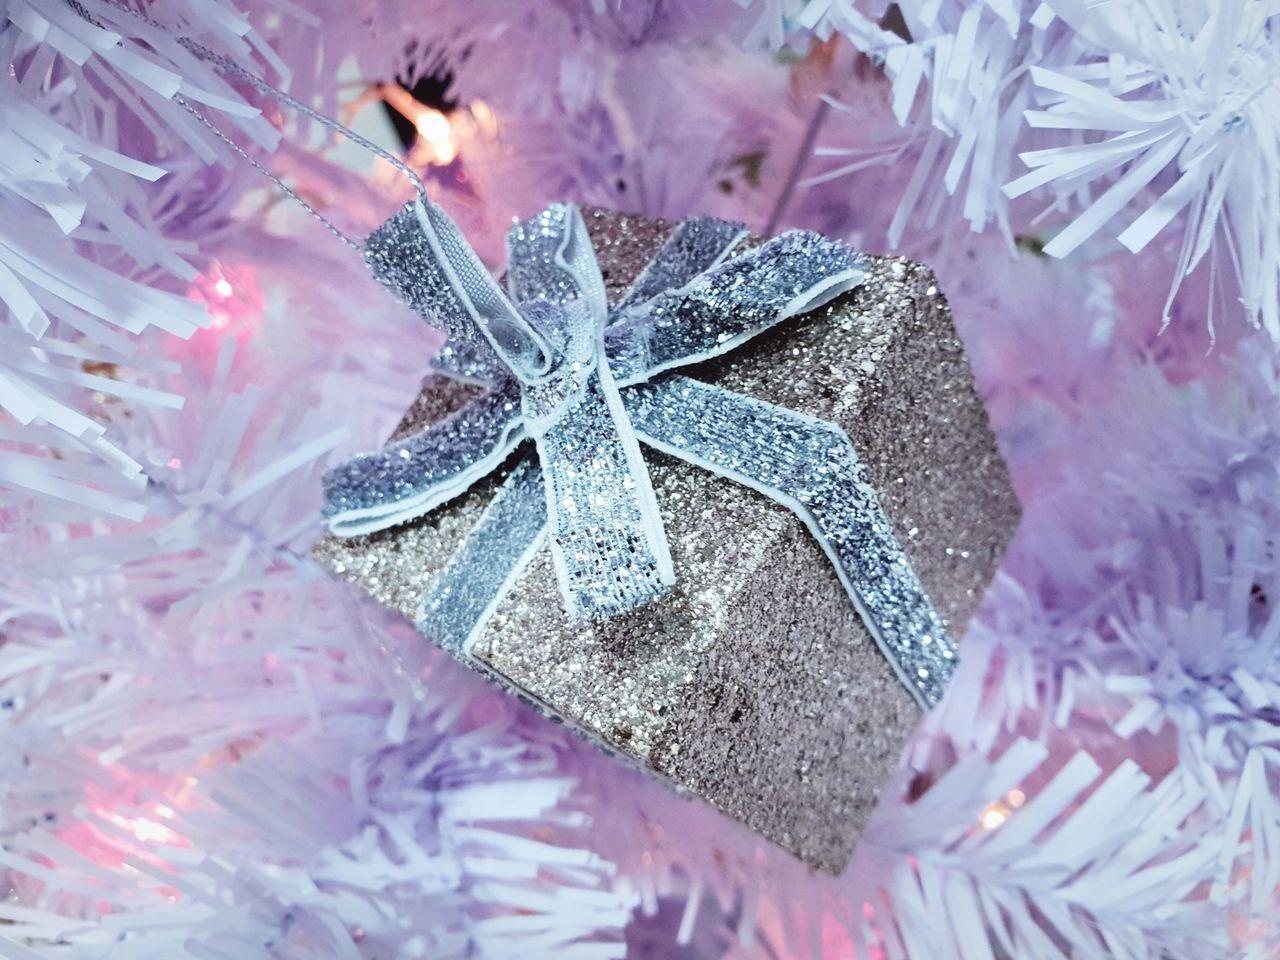 HIGH ANGLE VIEW OF CHRISTMAS DECORATIONS ON PURPLE